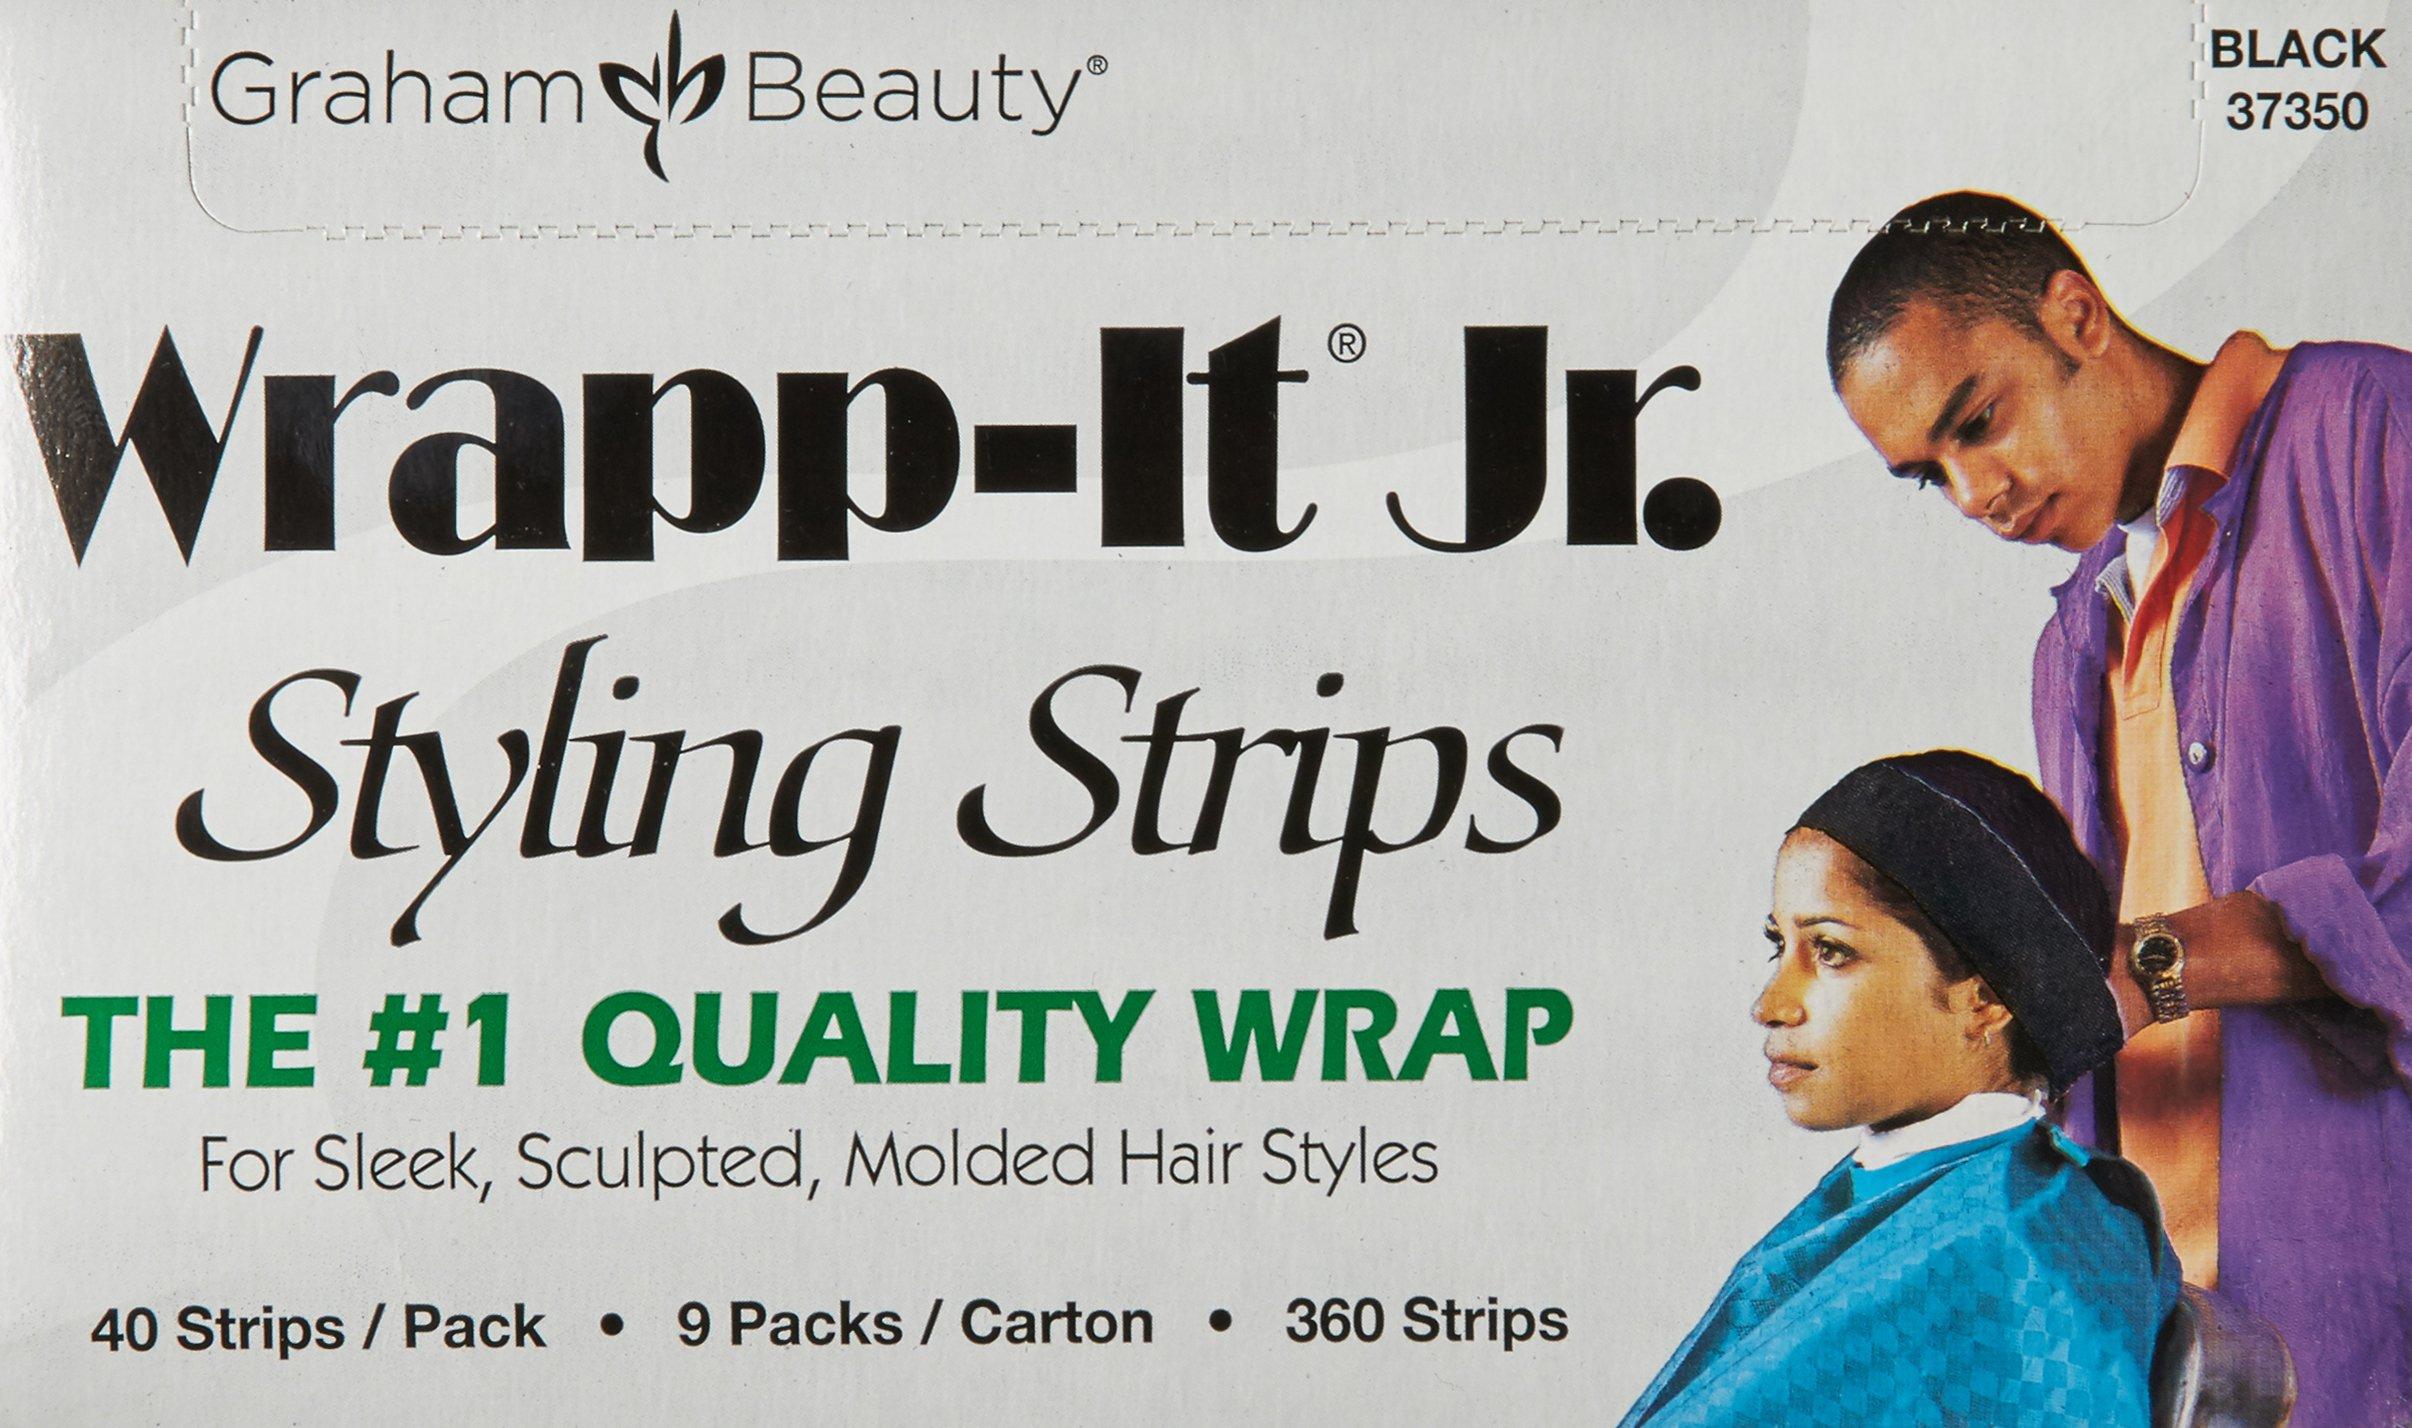 Graham Professional Beauty Wrapp-It Jr Styling Strips, Black by Graham Professional Beauty (Image #3)